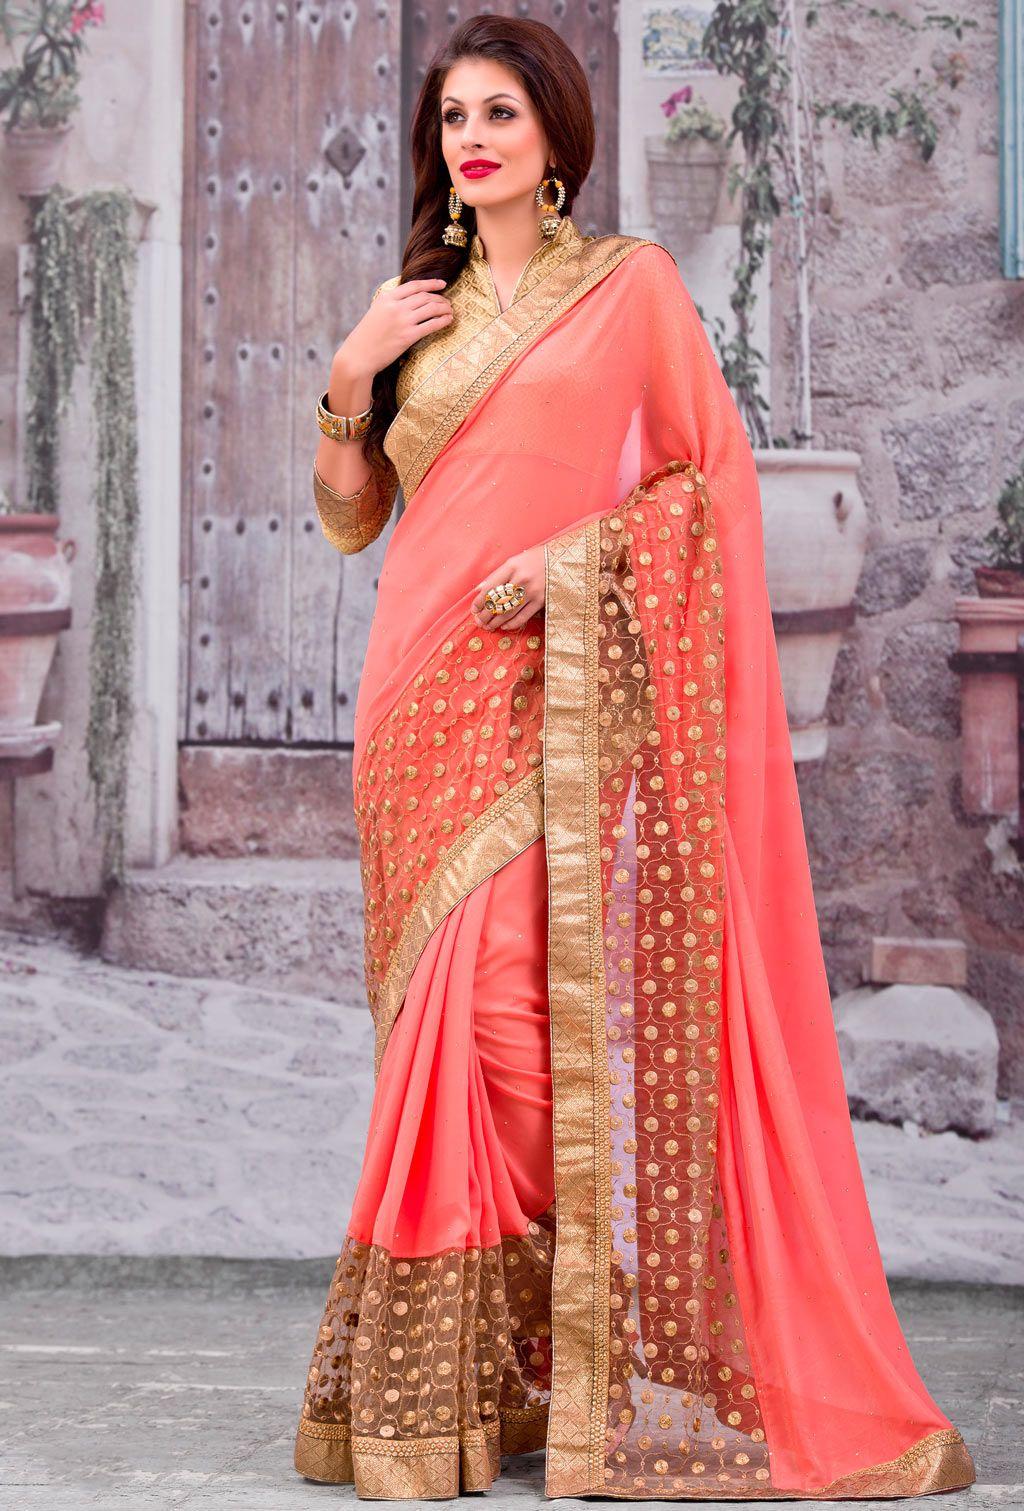 Peach color saree for wedding peach georgette party wear saree   saree u kurtha  pinterest